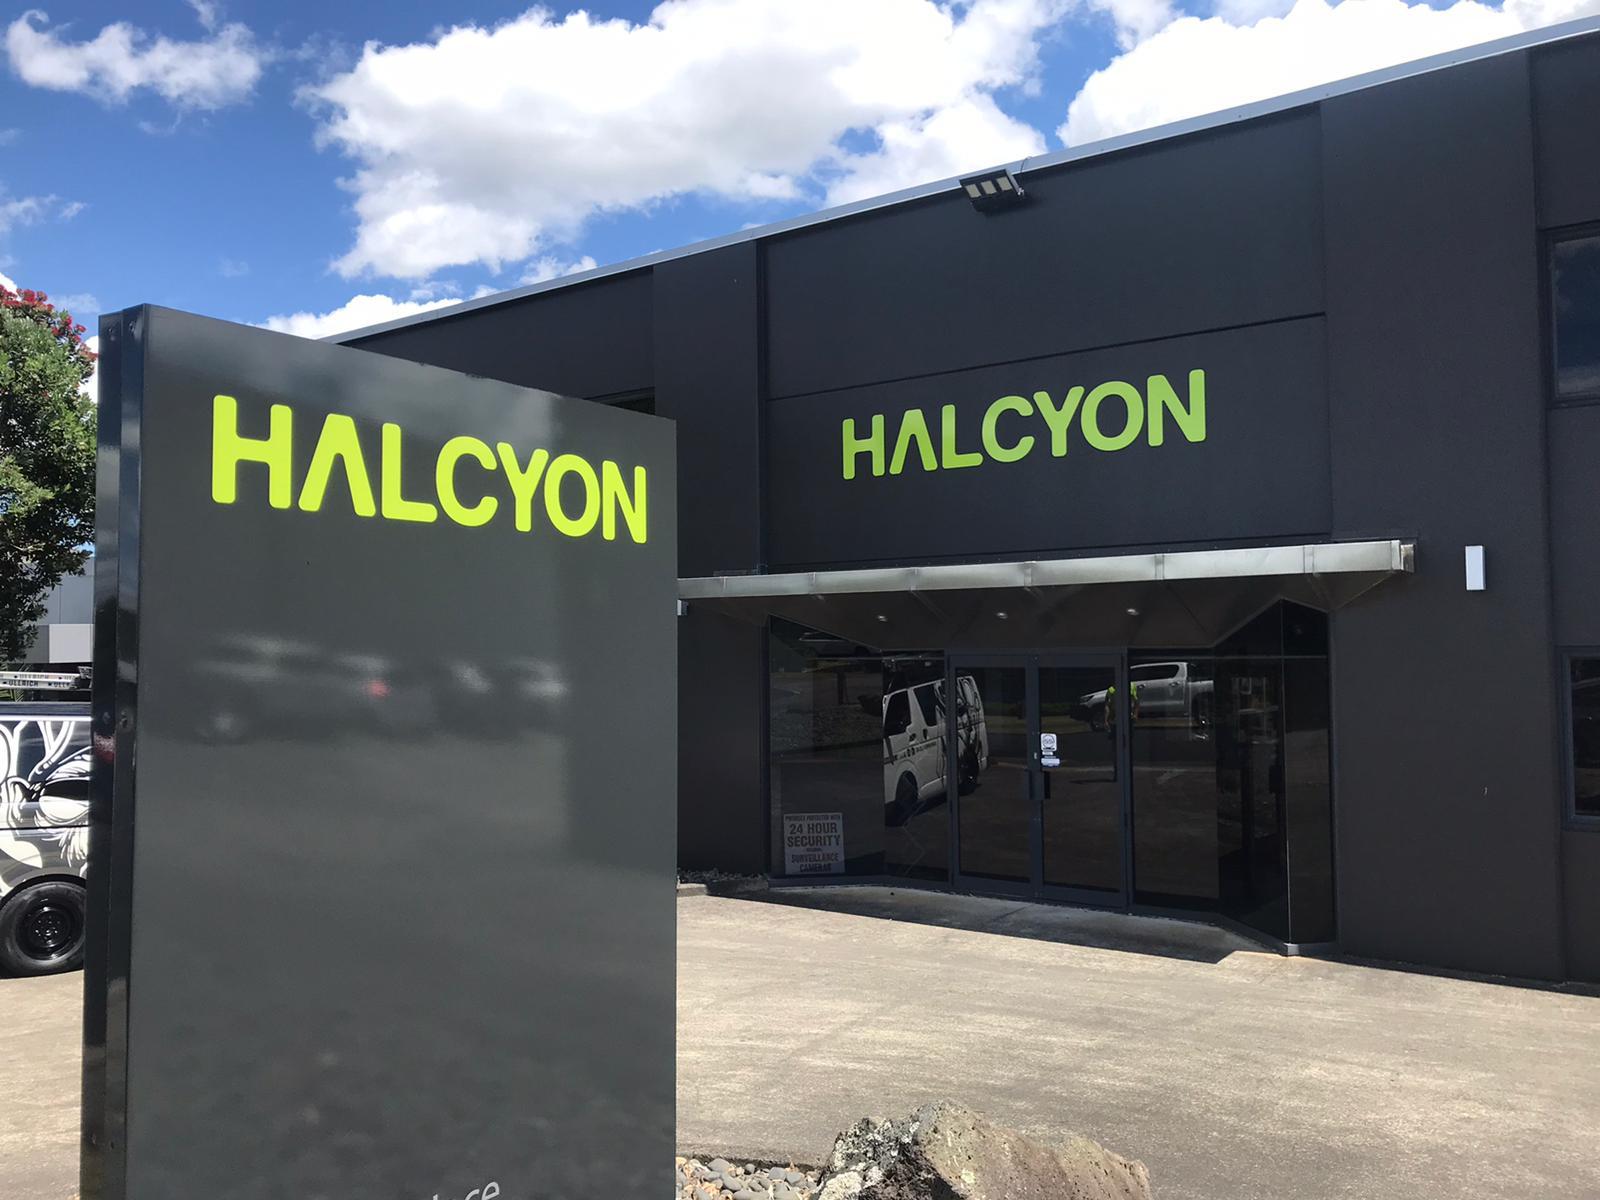 Halcyon signage